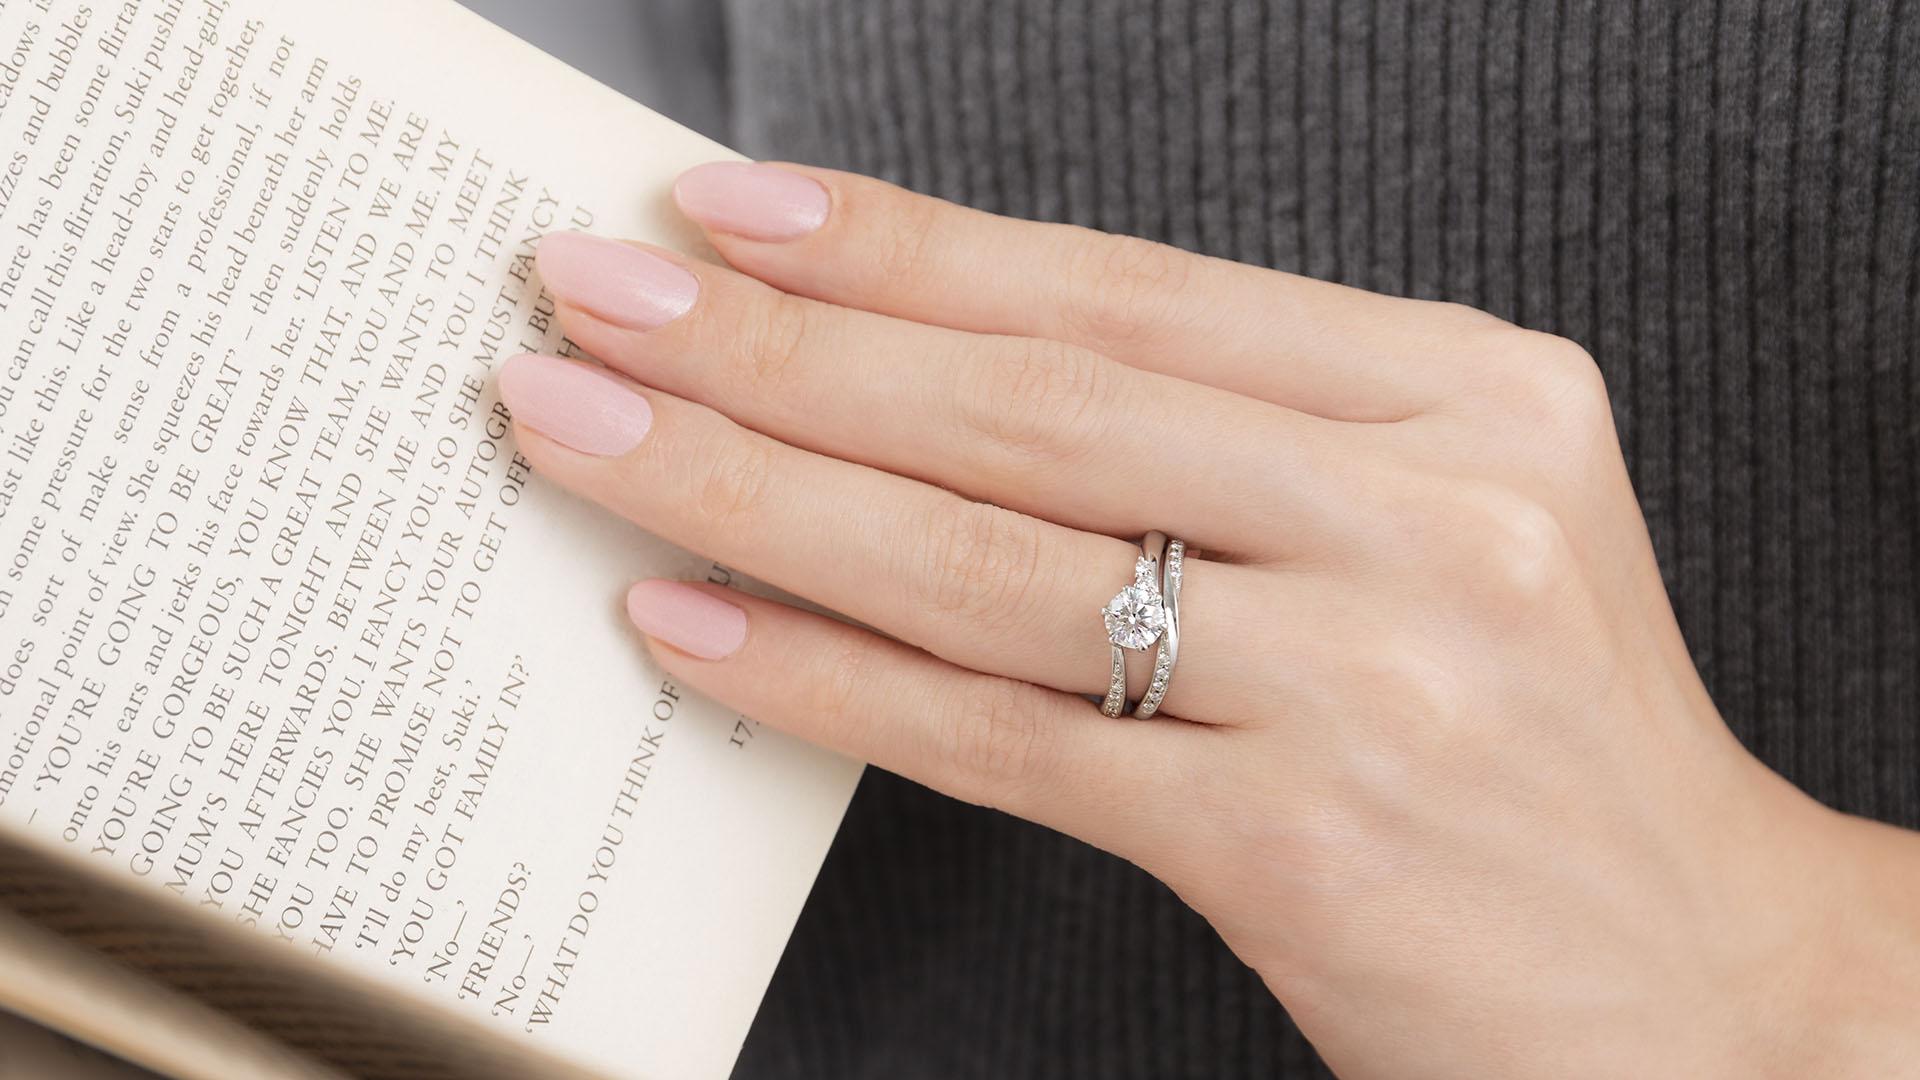 perseus ペルセウス   結婚指輪サムネイル 3